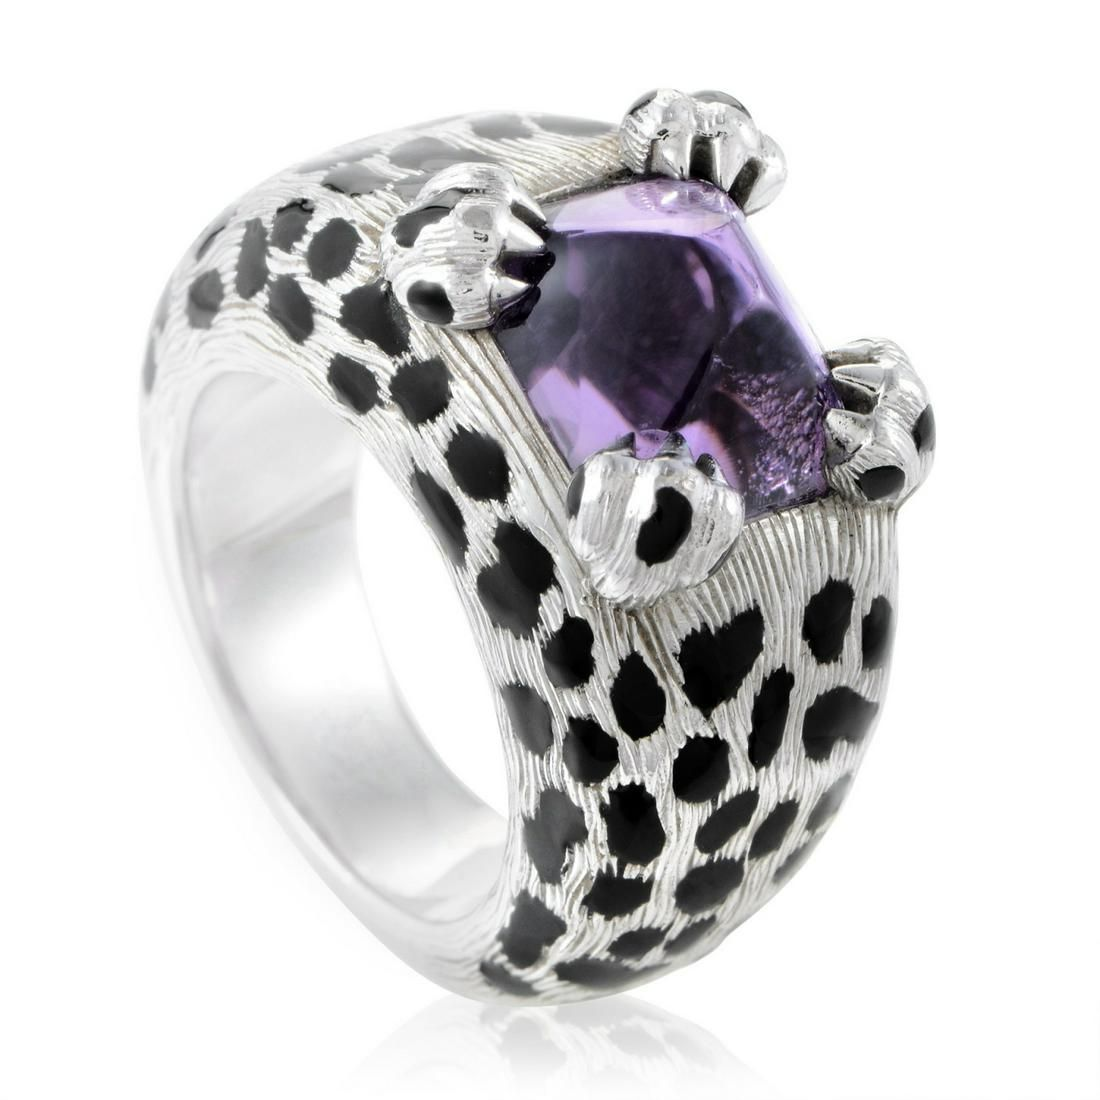 Dior Mitza Amethyst, Black Lacquer & 18K Ring